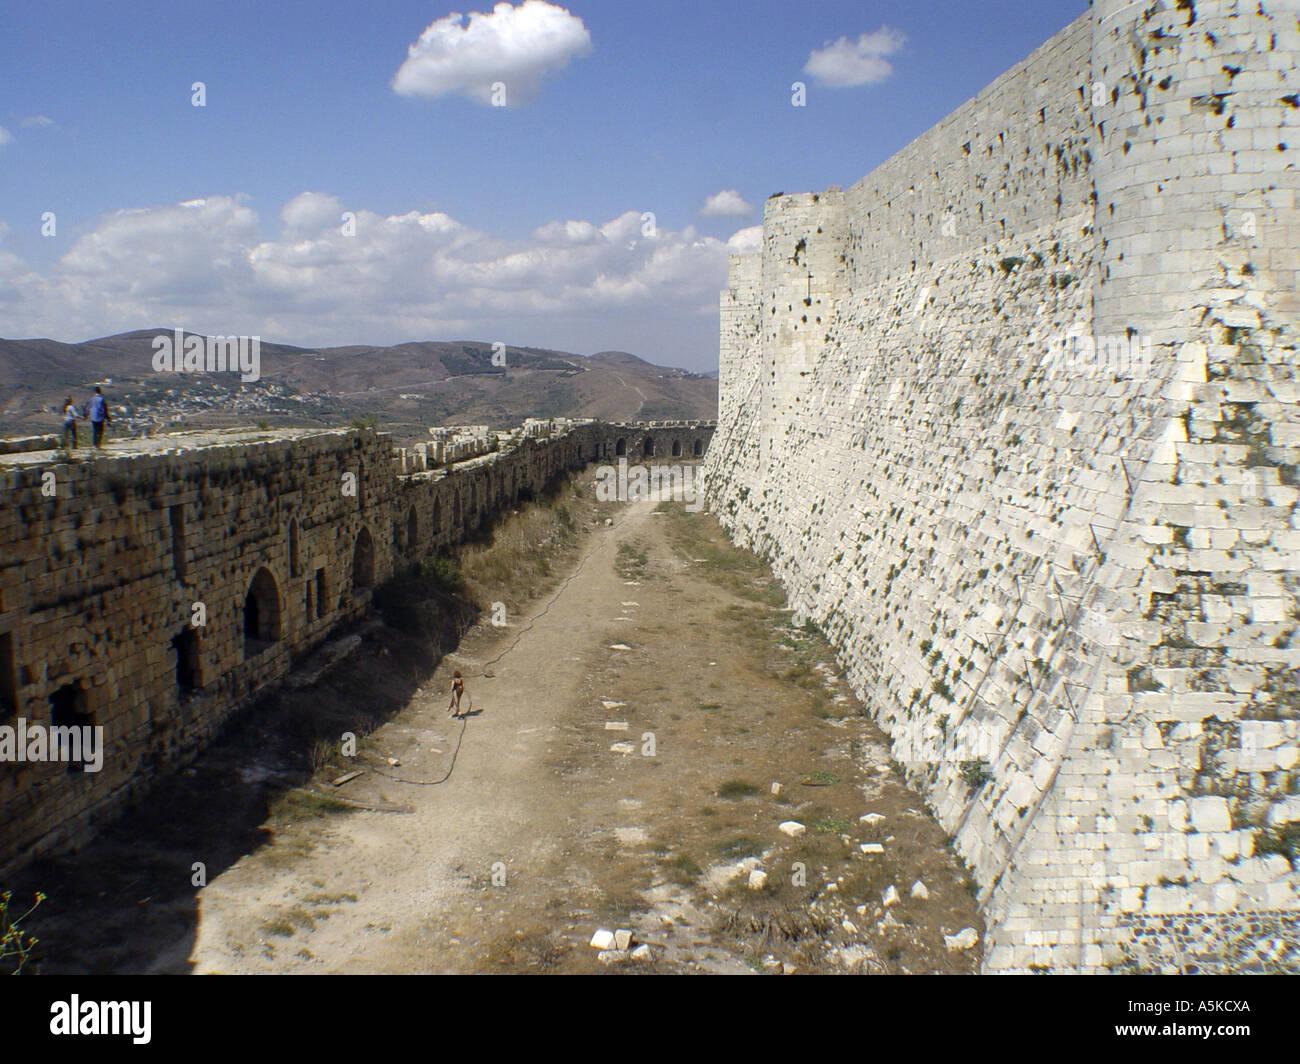 Crac des Chevaliers crusander castle in syria - Stock Image